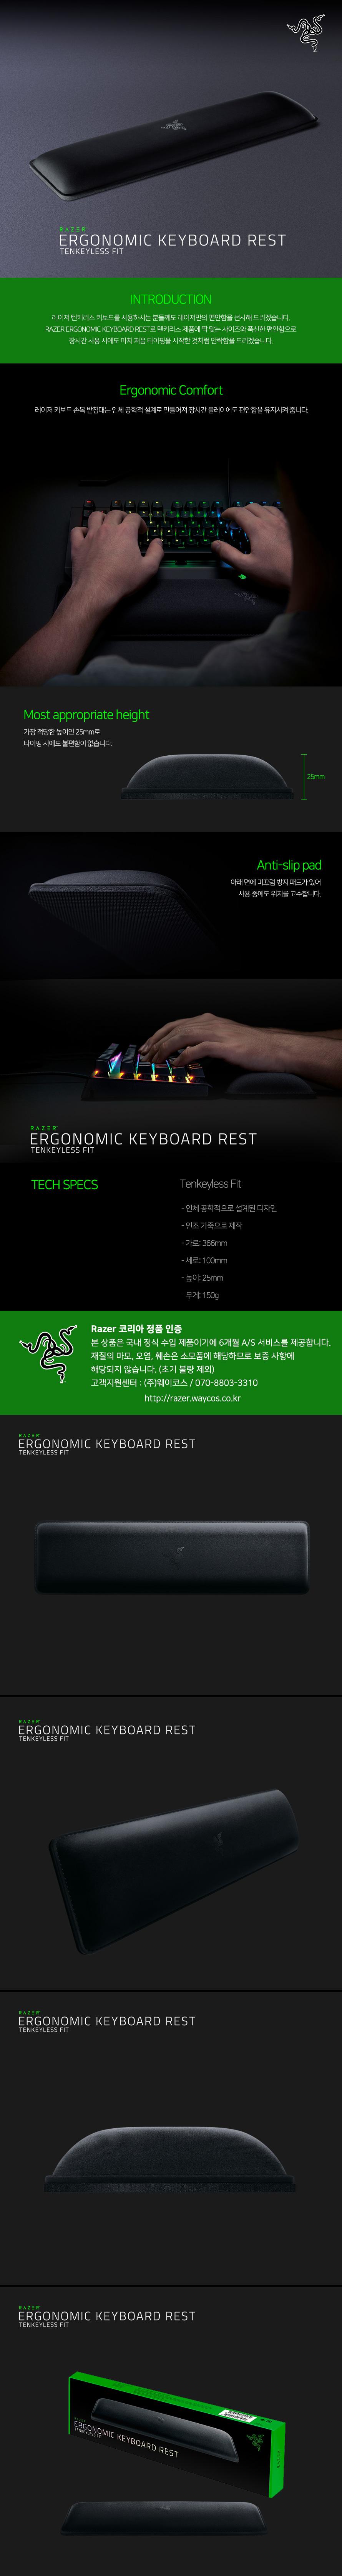 Razer  Ergonomic Keyboard Rest(텐키리스)